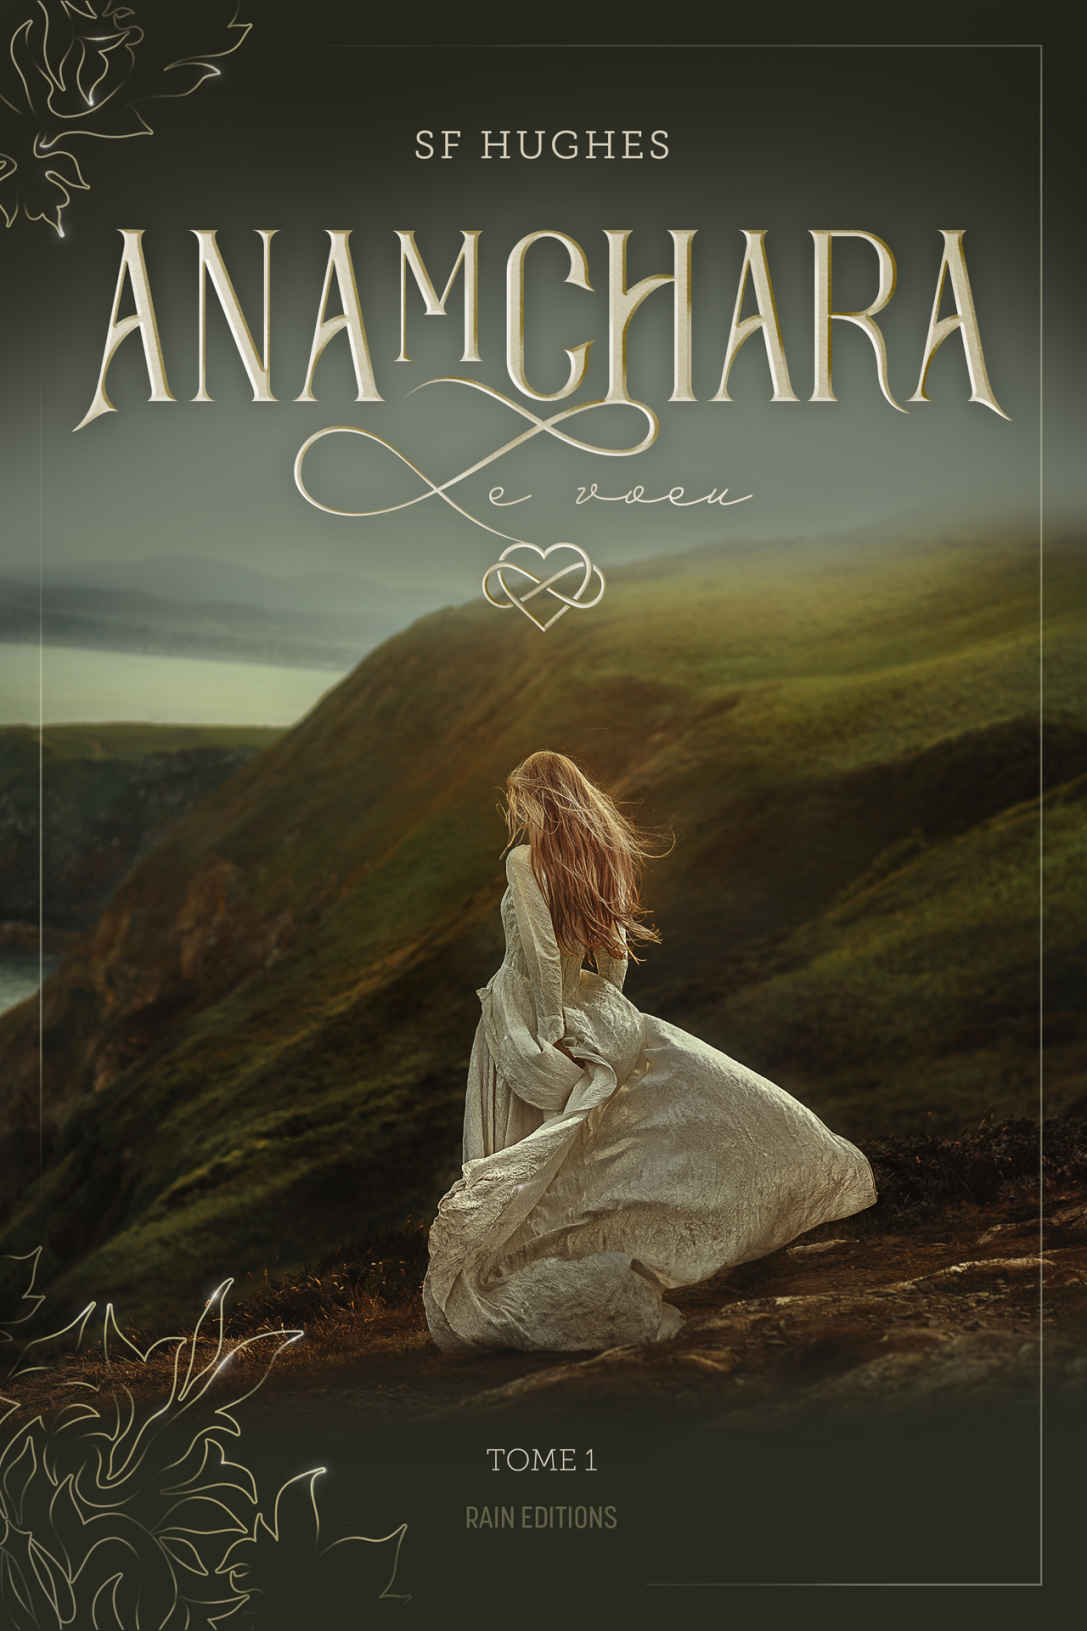 Anamchara : Le voeu, Tome 1